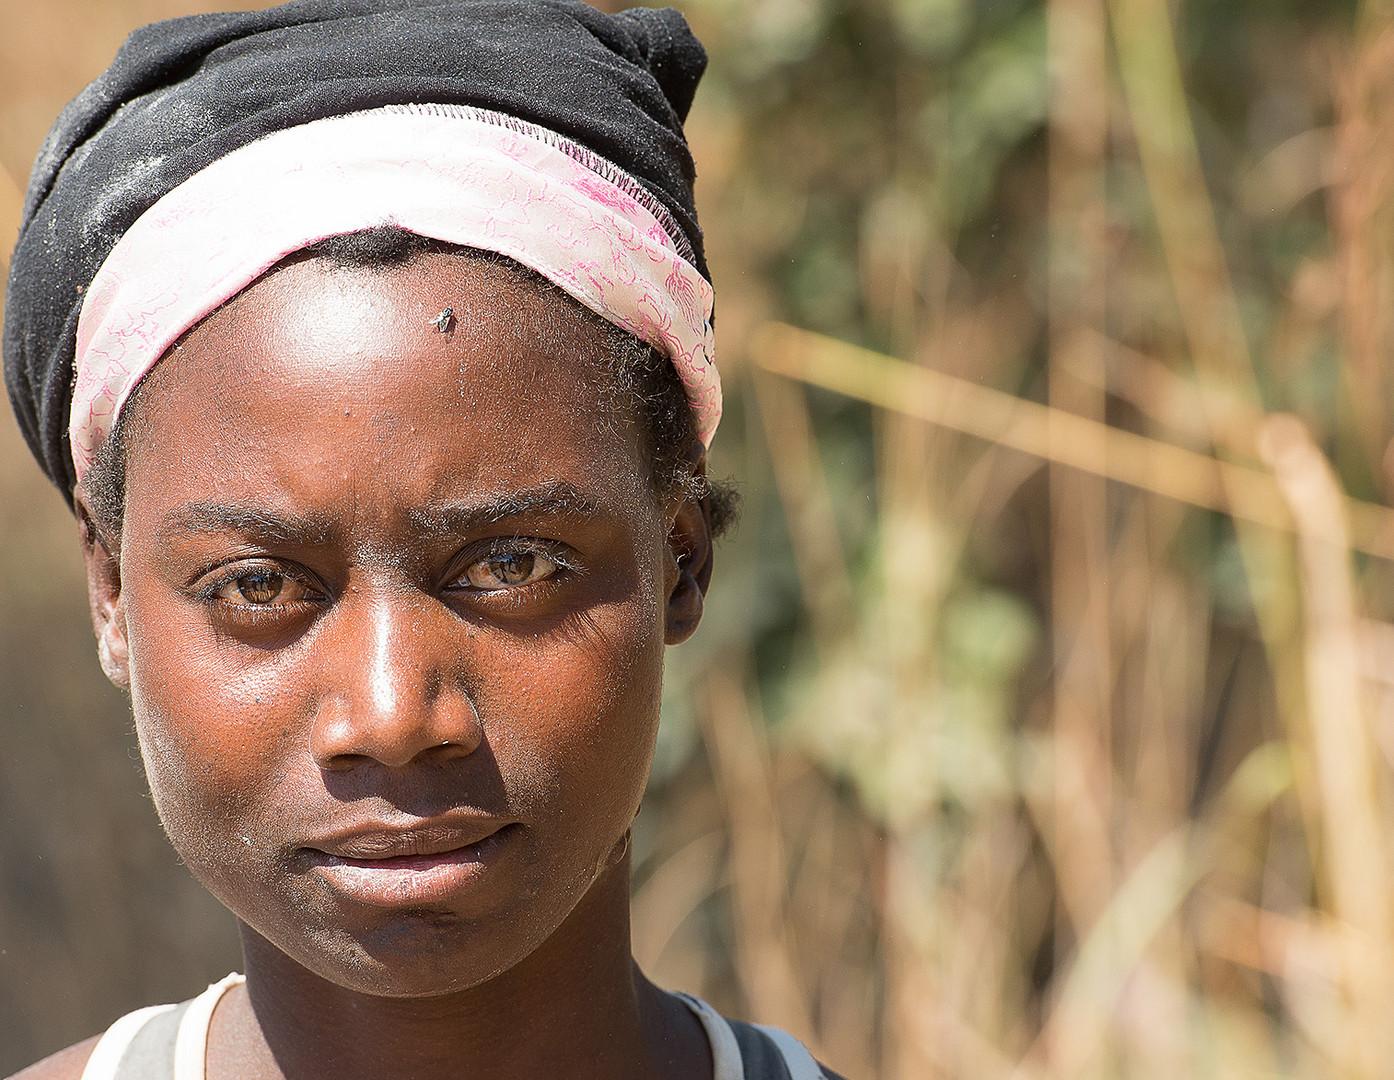 Frau aus Zambia